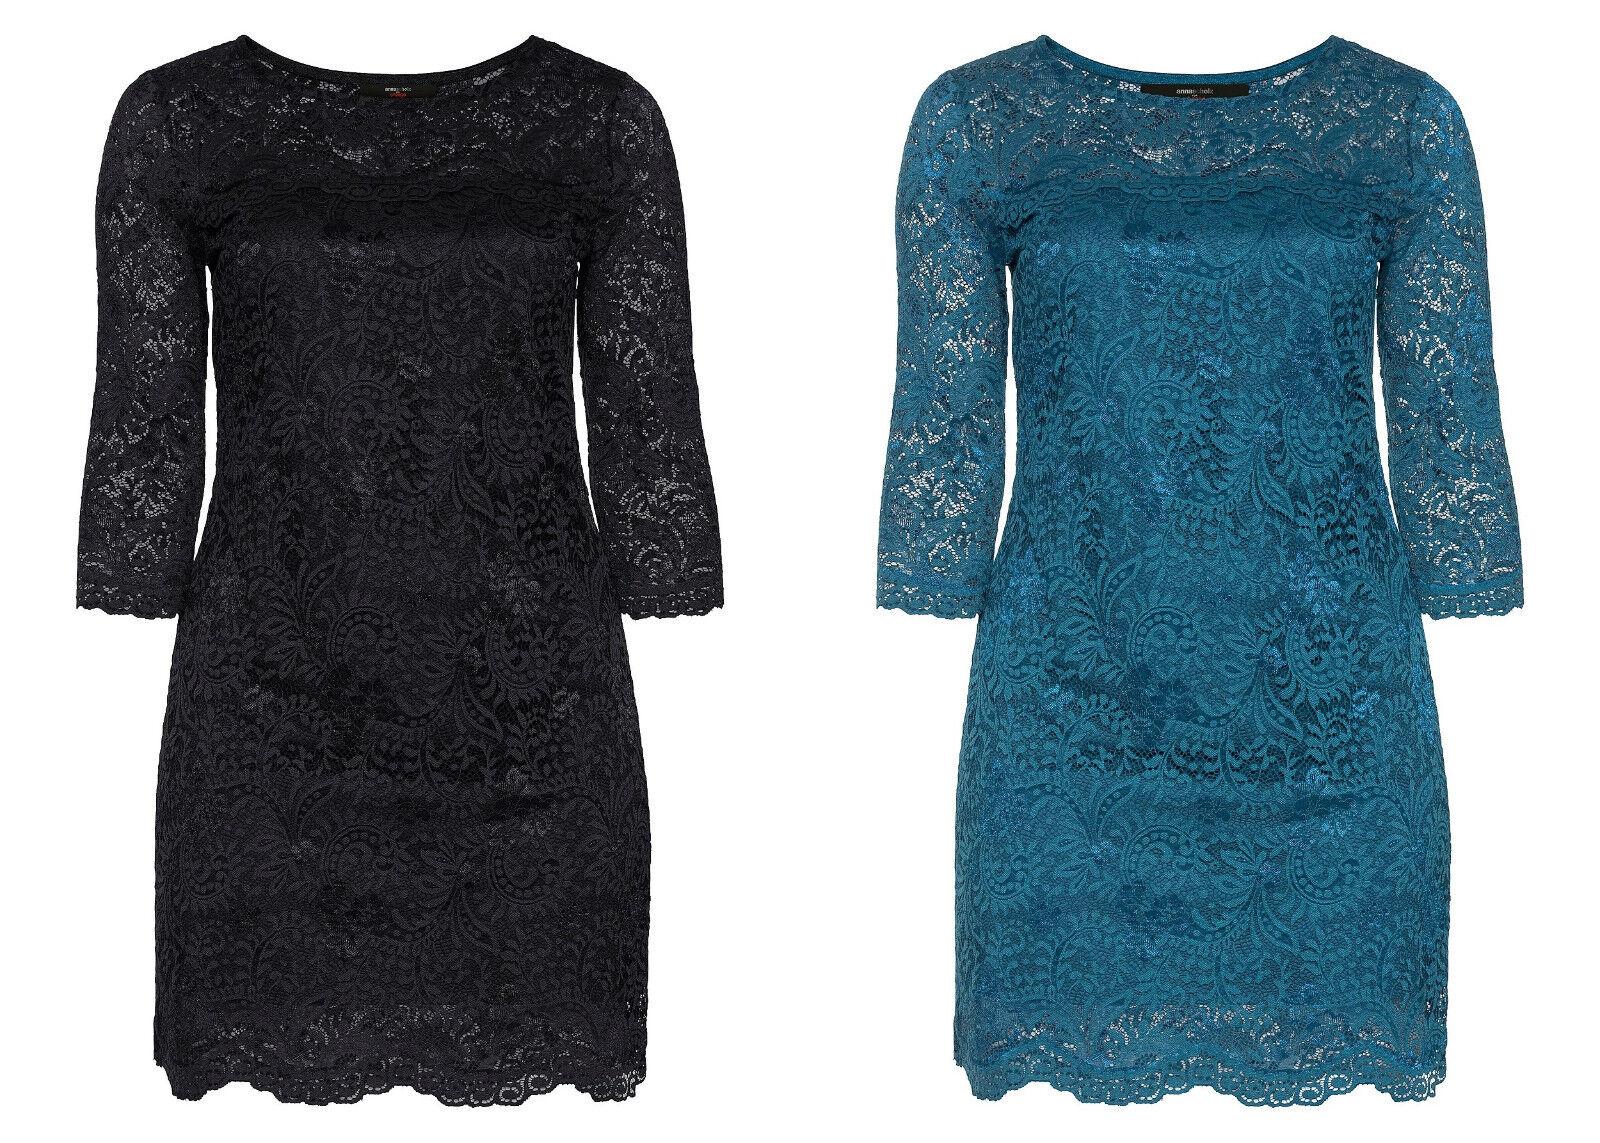 Sheego Damen Kleid Dress Abikleid Cocktail Party Abend Schwarz Blau NEU